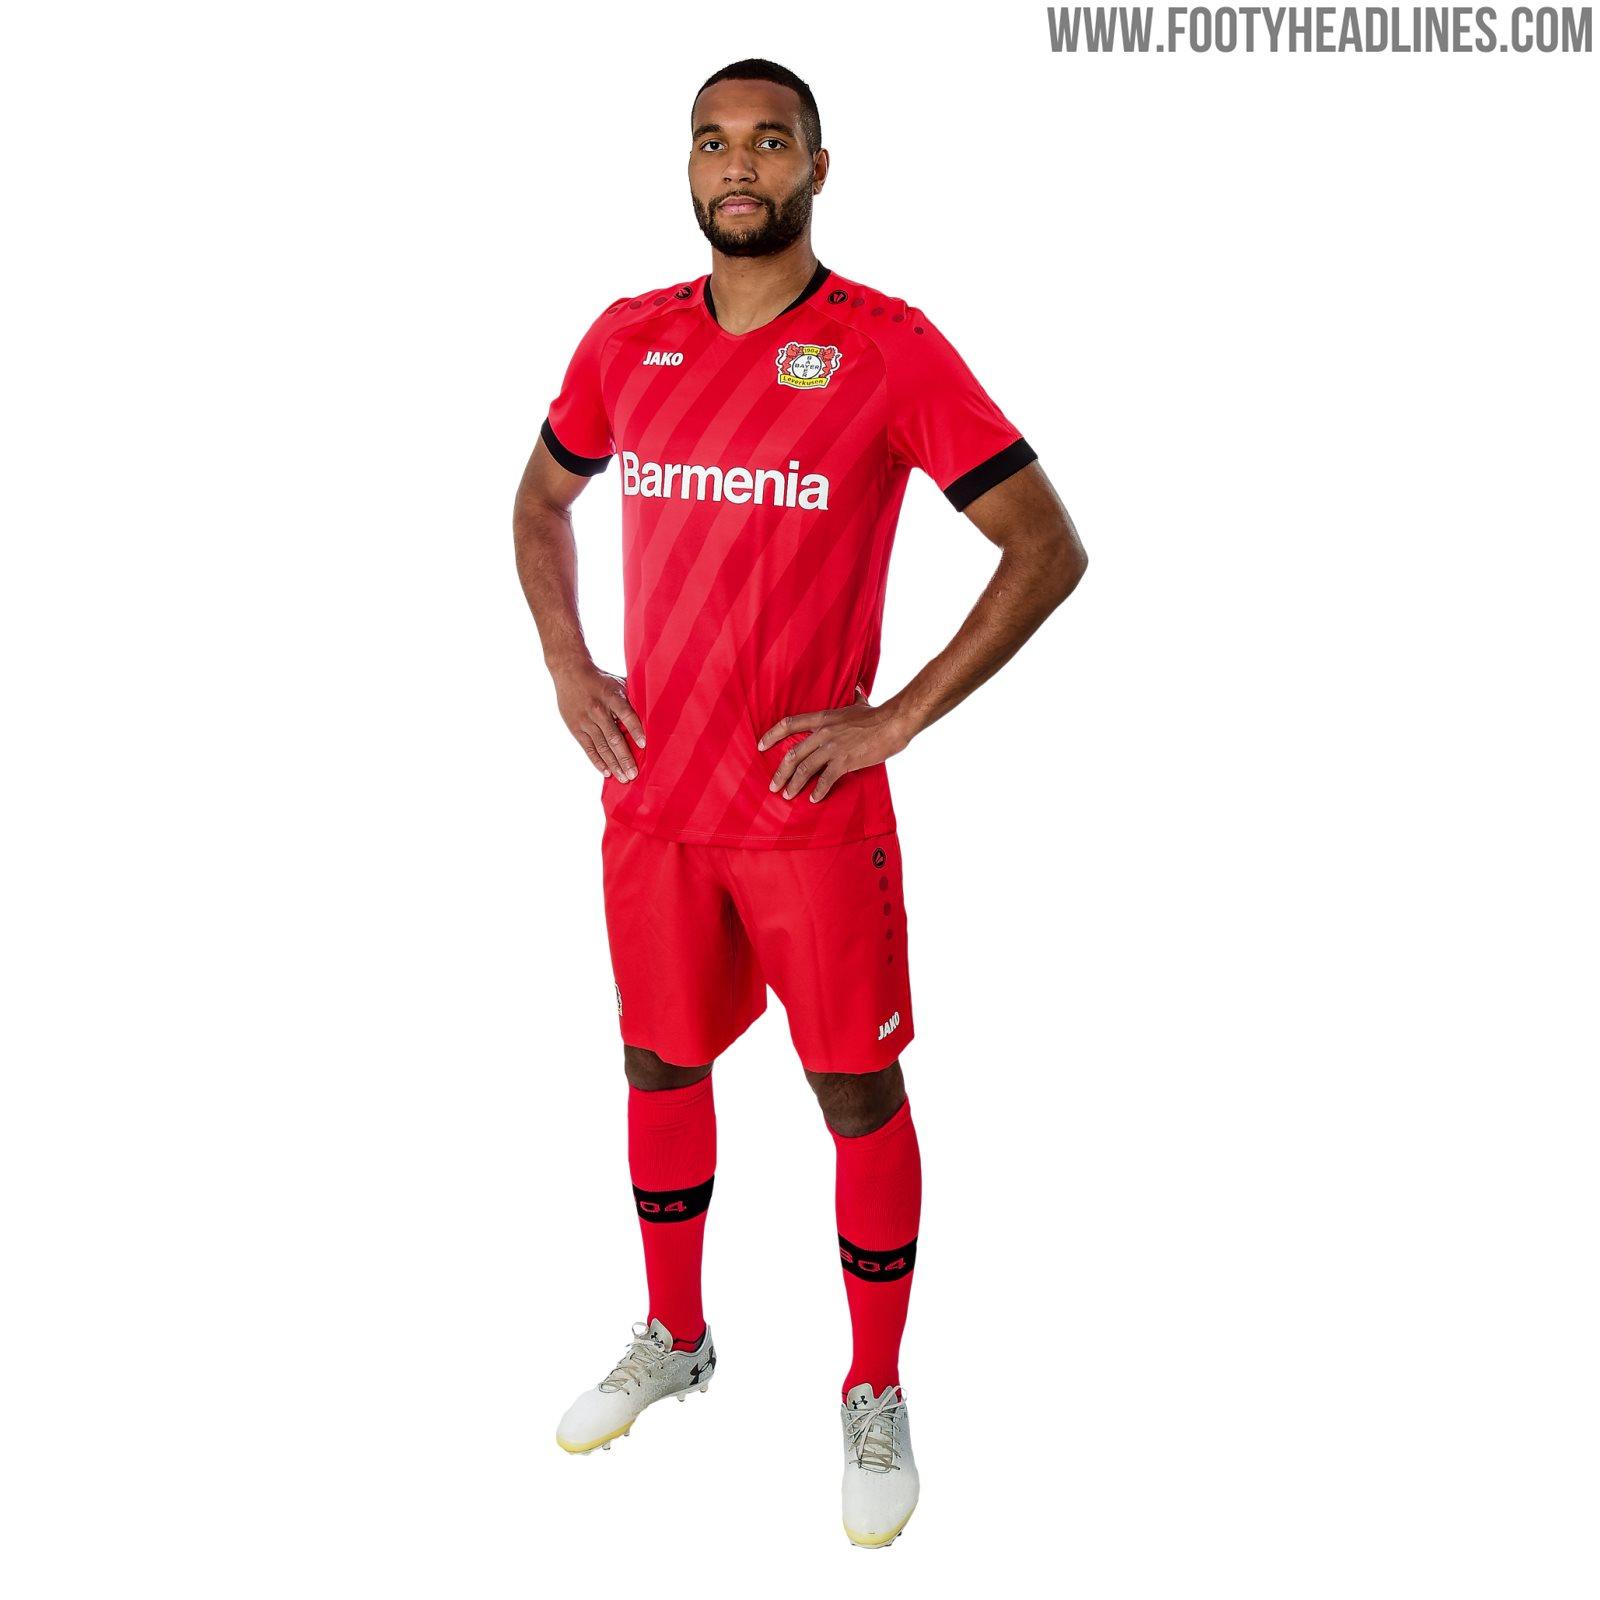 Leverkusen Bayern 2020